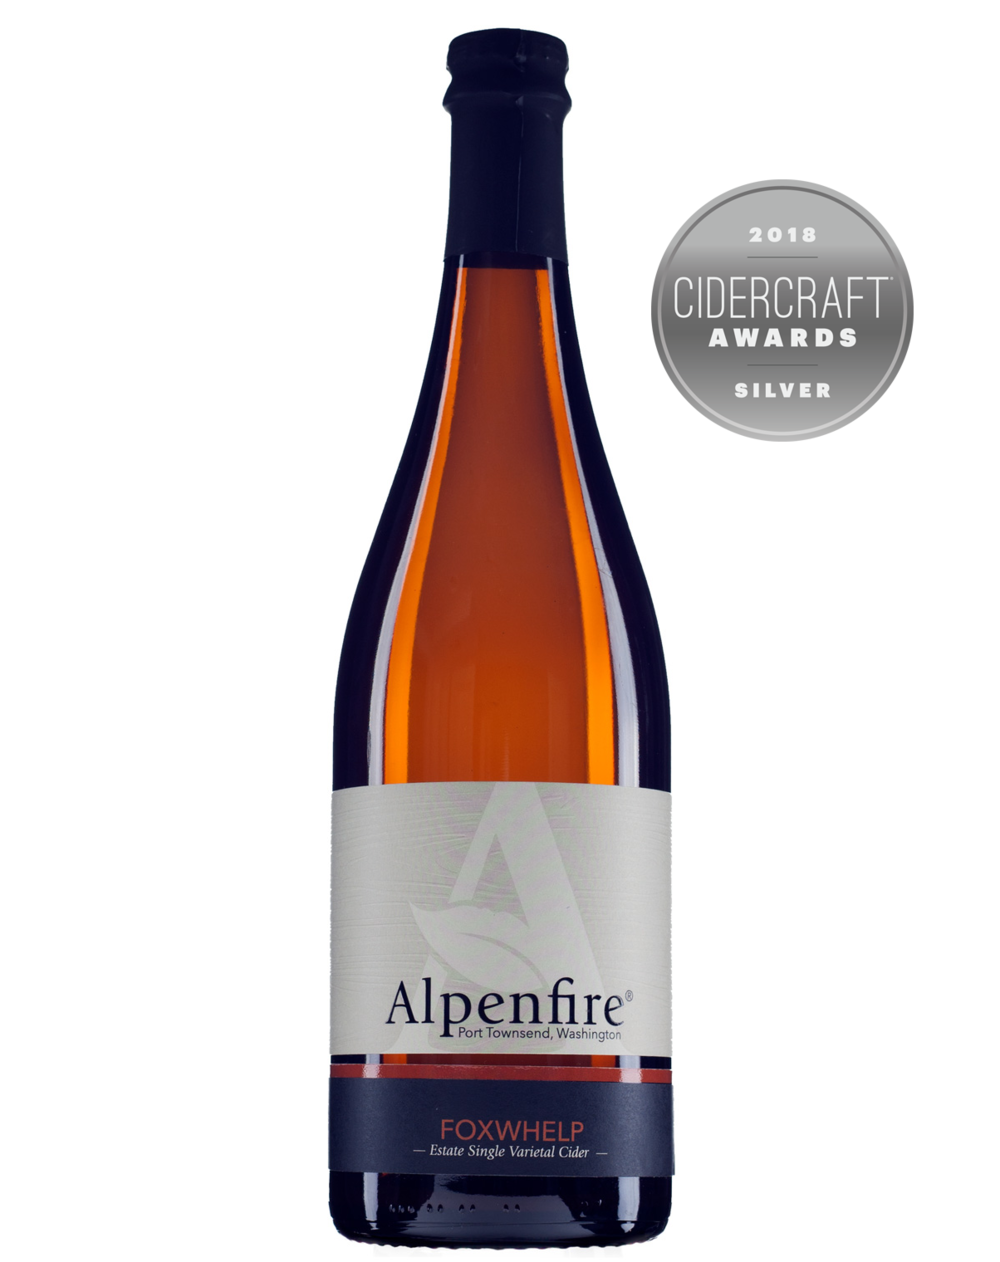 Alpenfire-Foxwhelp-Estate-Single-Varietal-Cider-Cidercraft-Silver.png